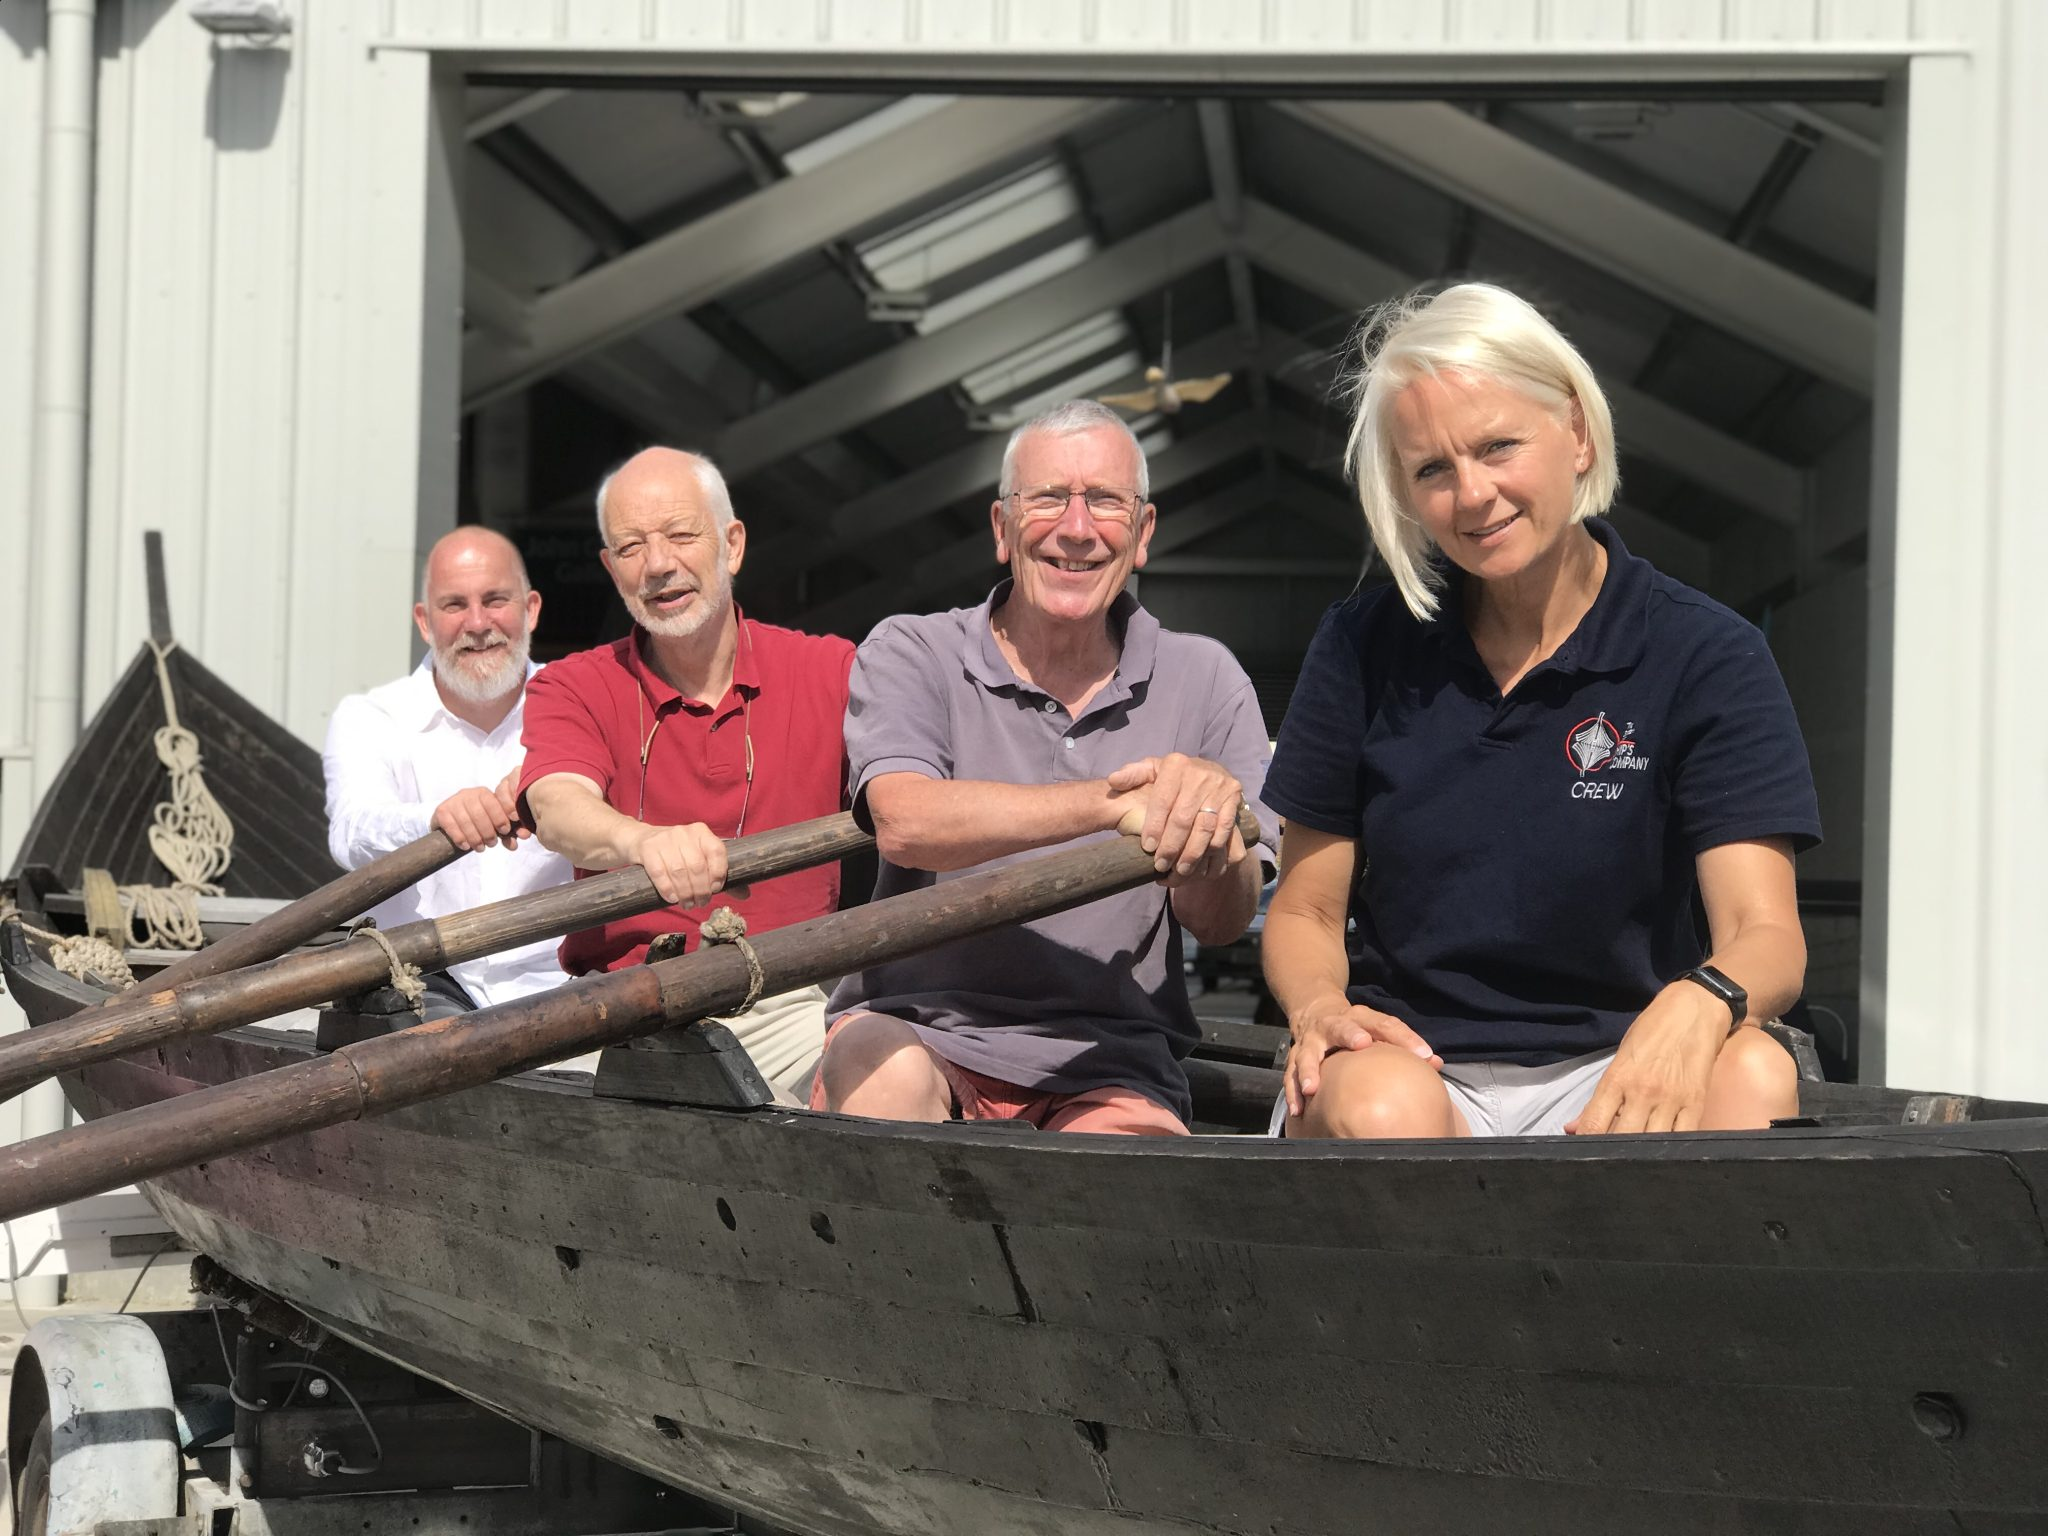 Public urged to 'make ship happen' for Sutton Hoo rebuild